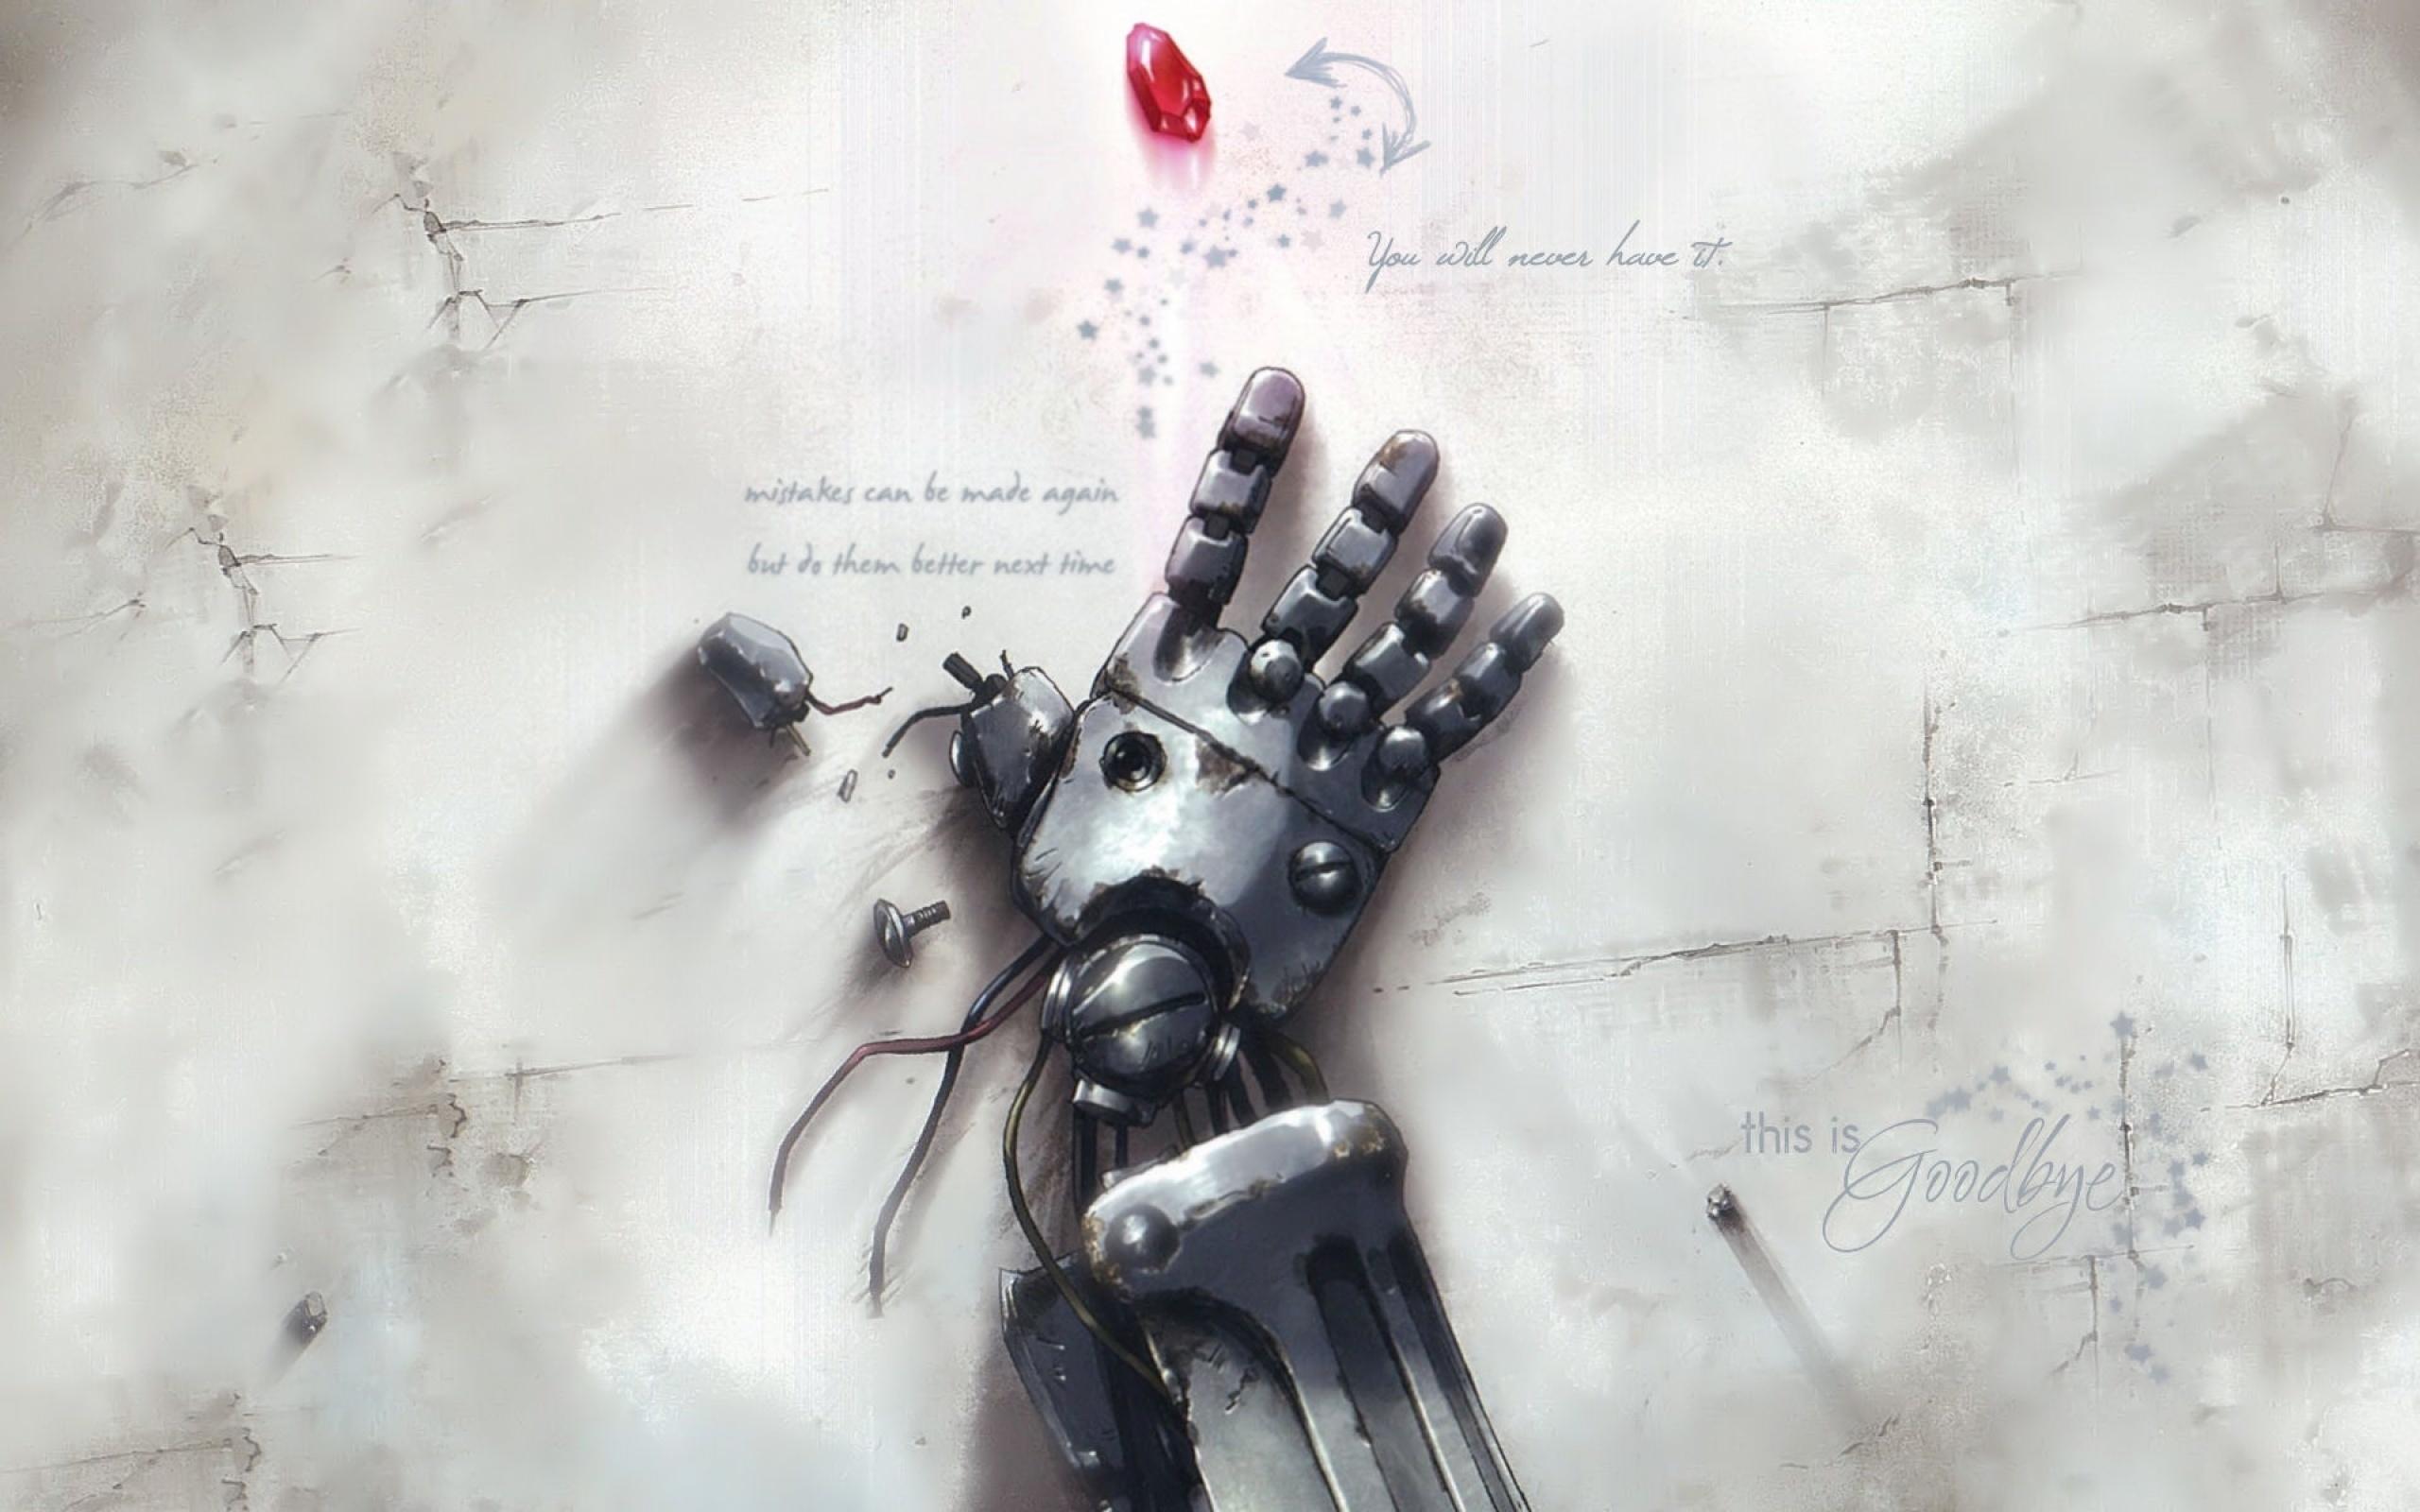 fullmetal alchemist full hd fond d'écran and arrière-plan